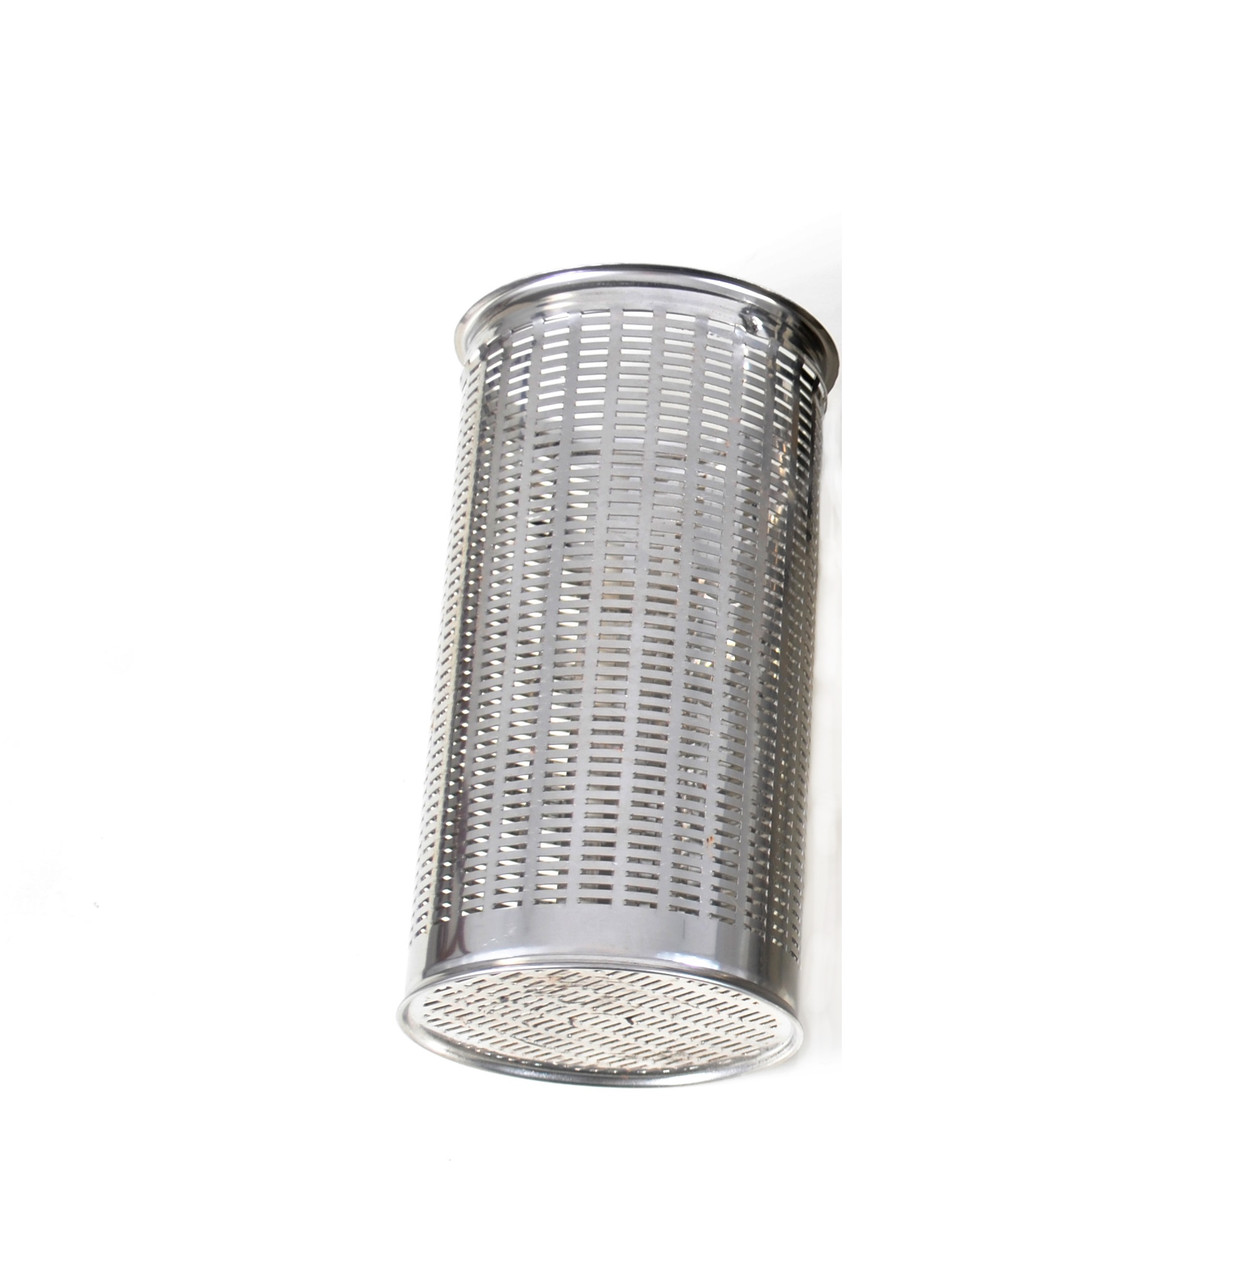 Стакан (бункер) для джин кошика